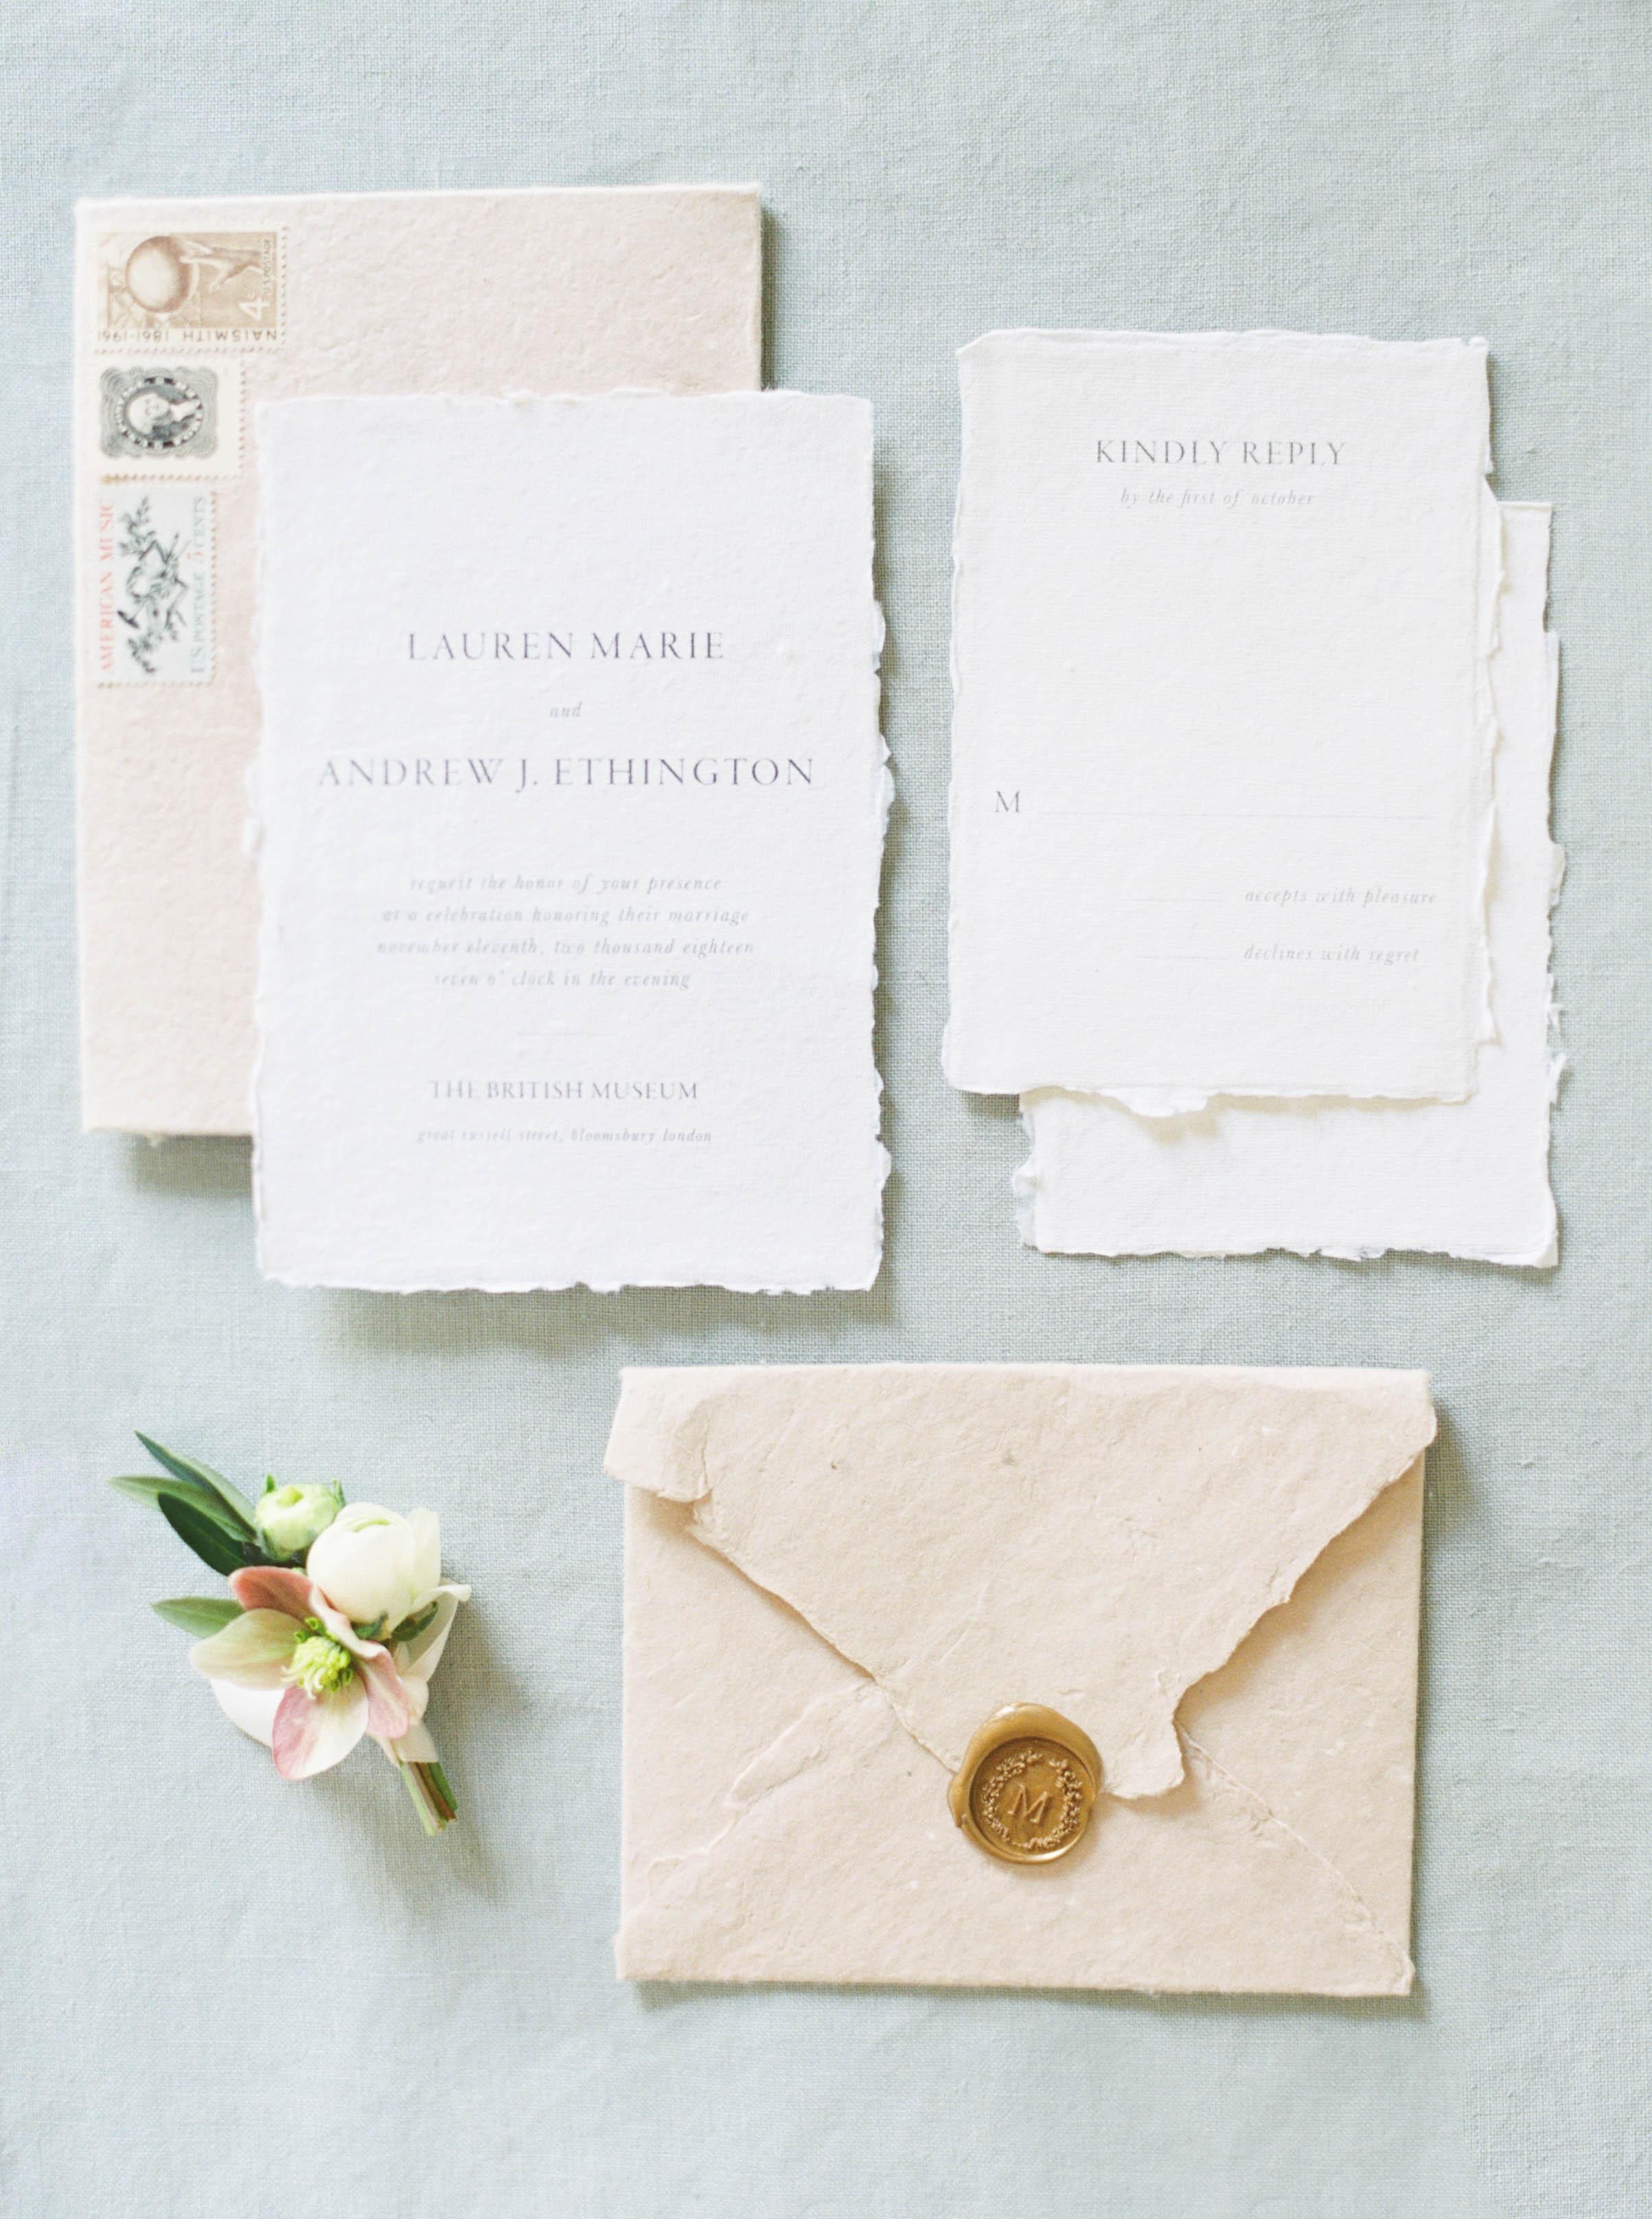 ink&pressco-mikylamanu-wedding-calligraphy-7-unearthing.tc.jpg